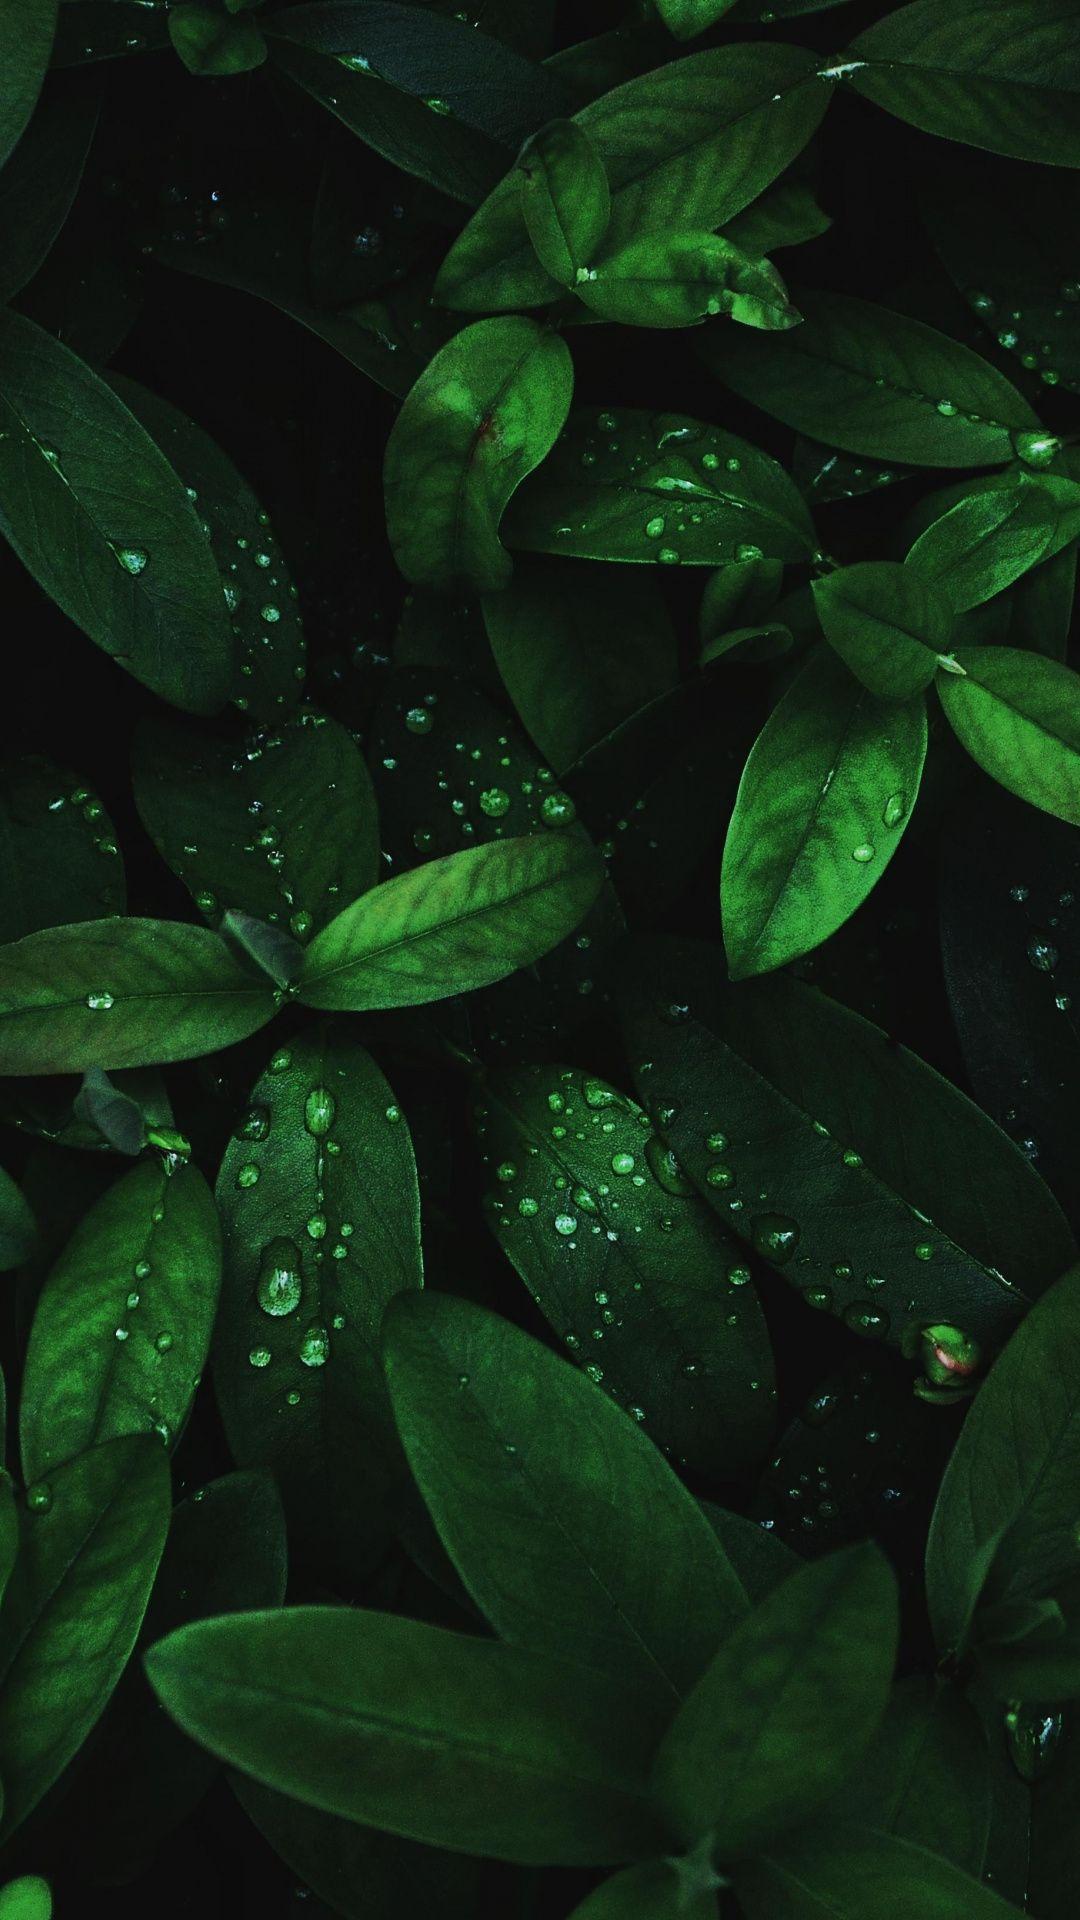 Flora Drops Green Leaves 1080x1920 Wallpaper Zelenye Fony